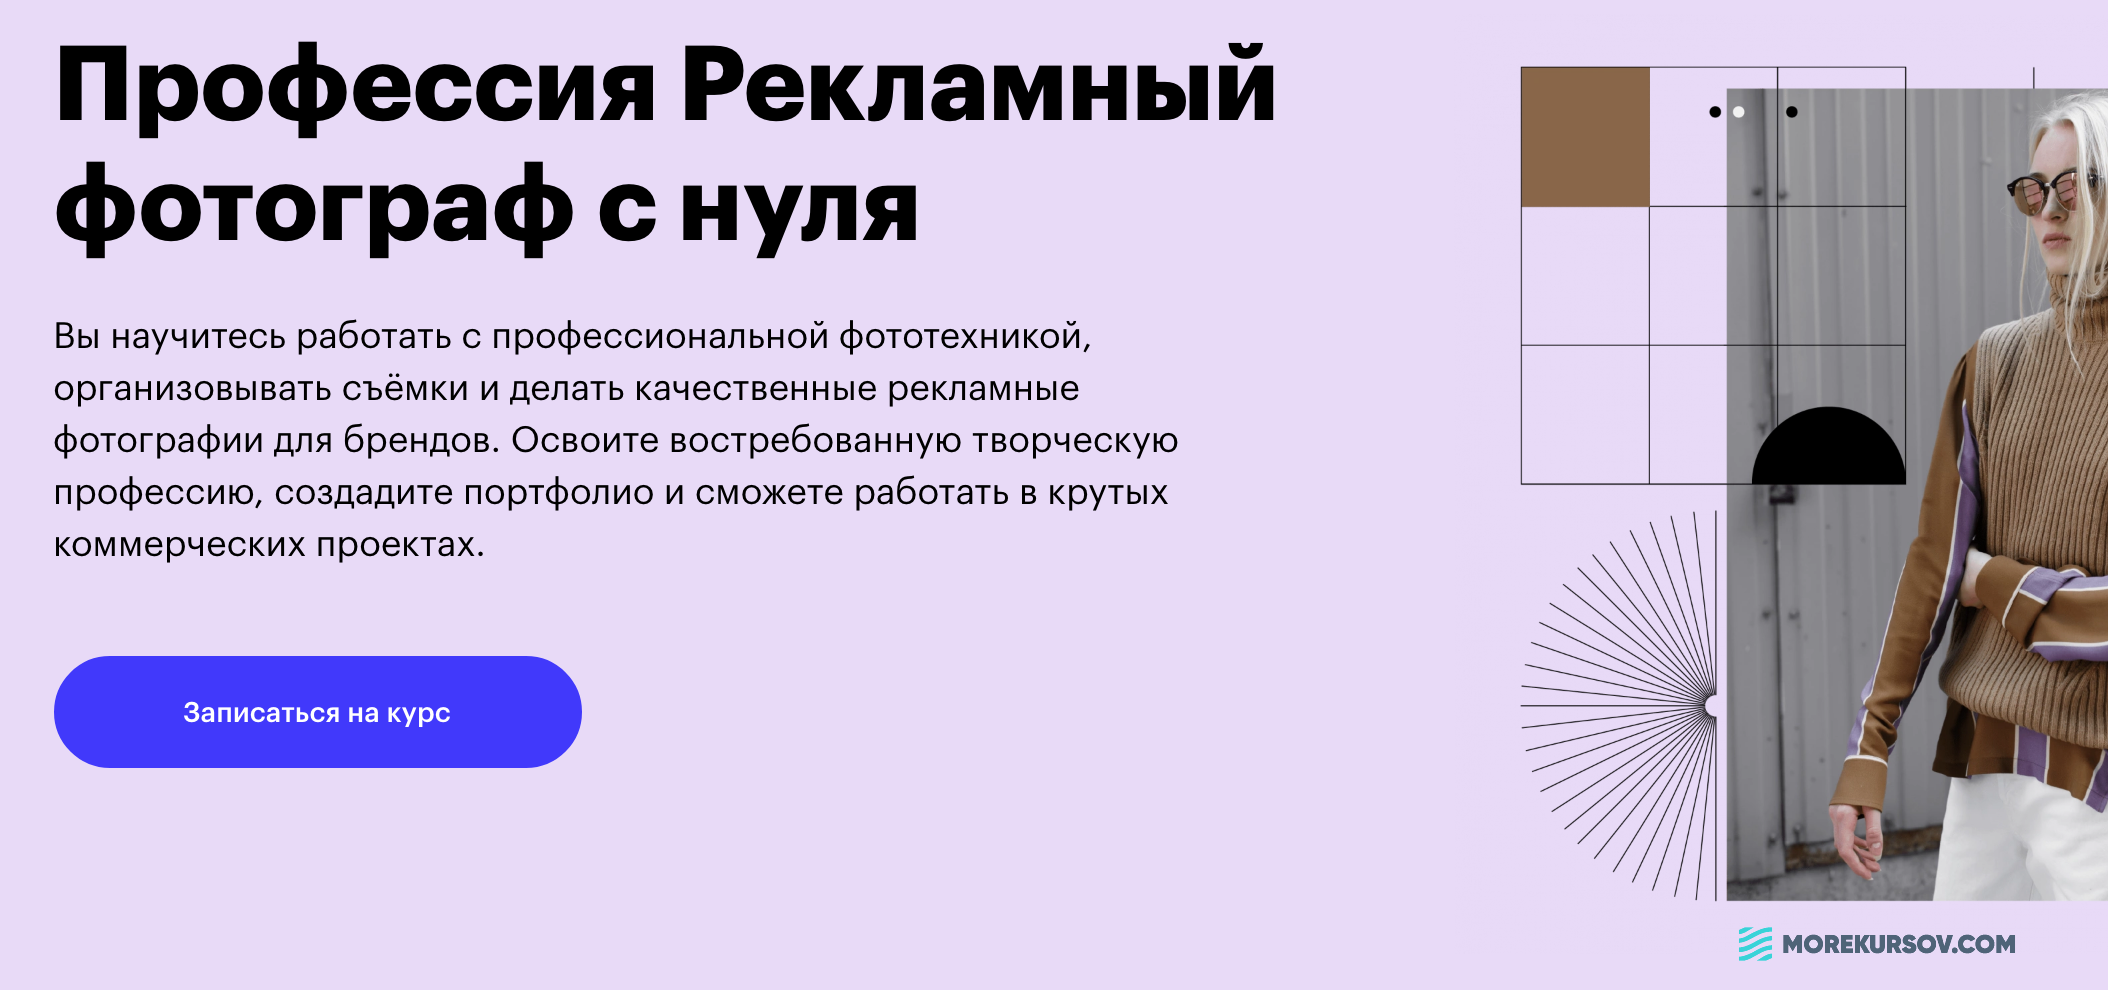 snimok-ehkrana-2020-09-13-v-11-28-10-png.9627